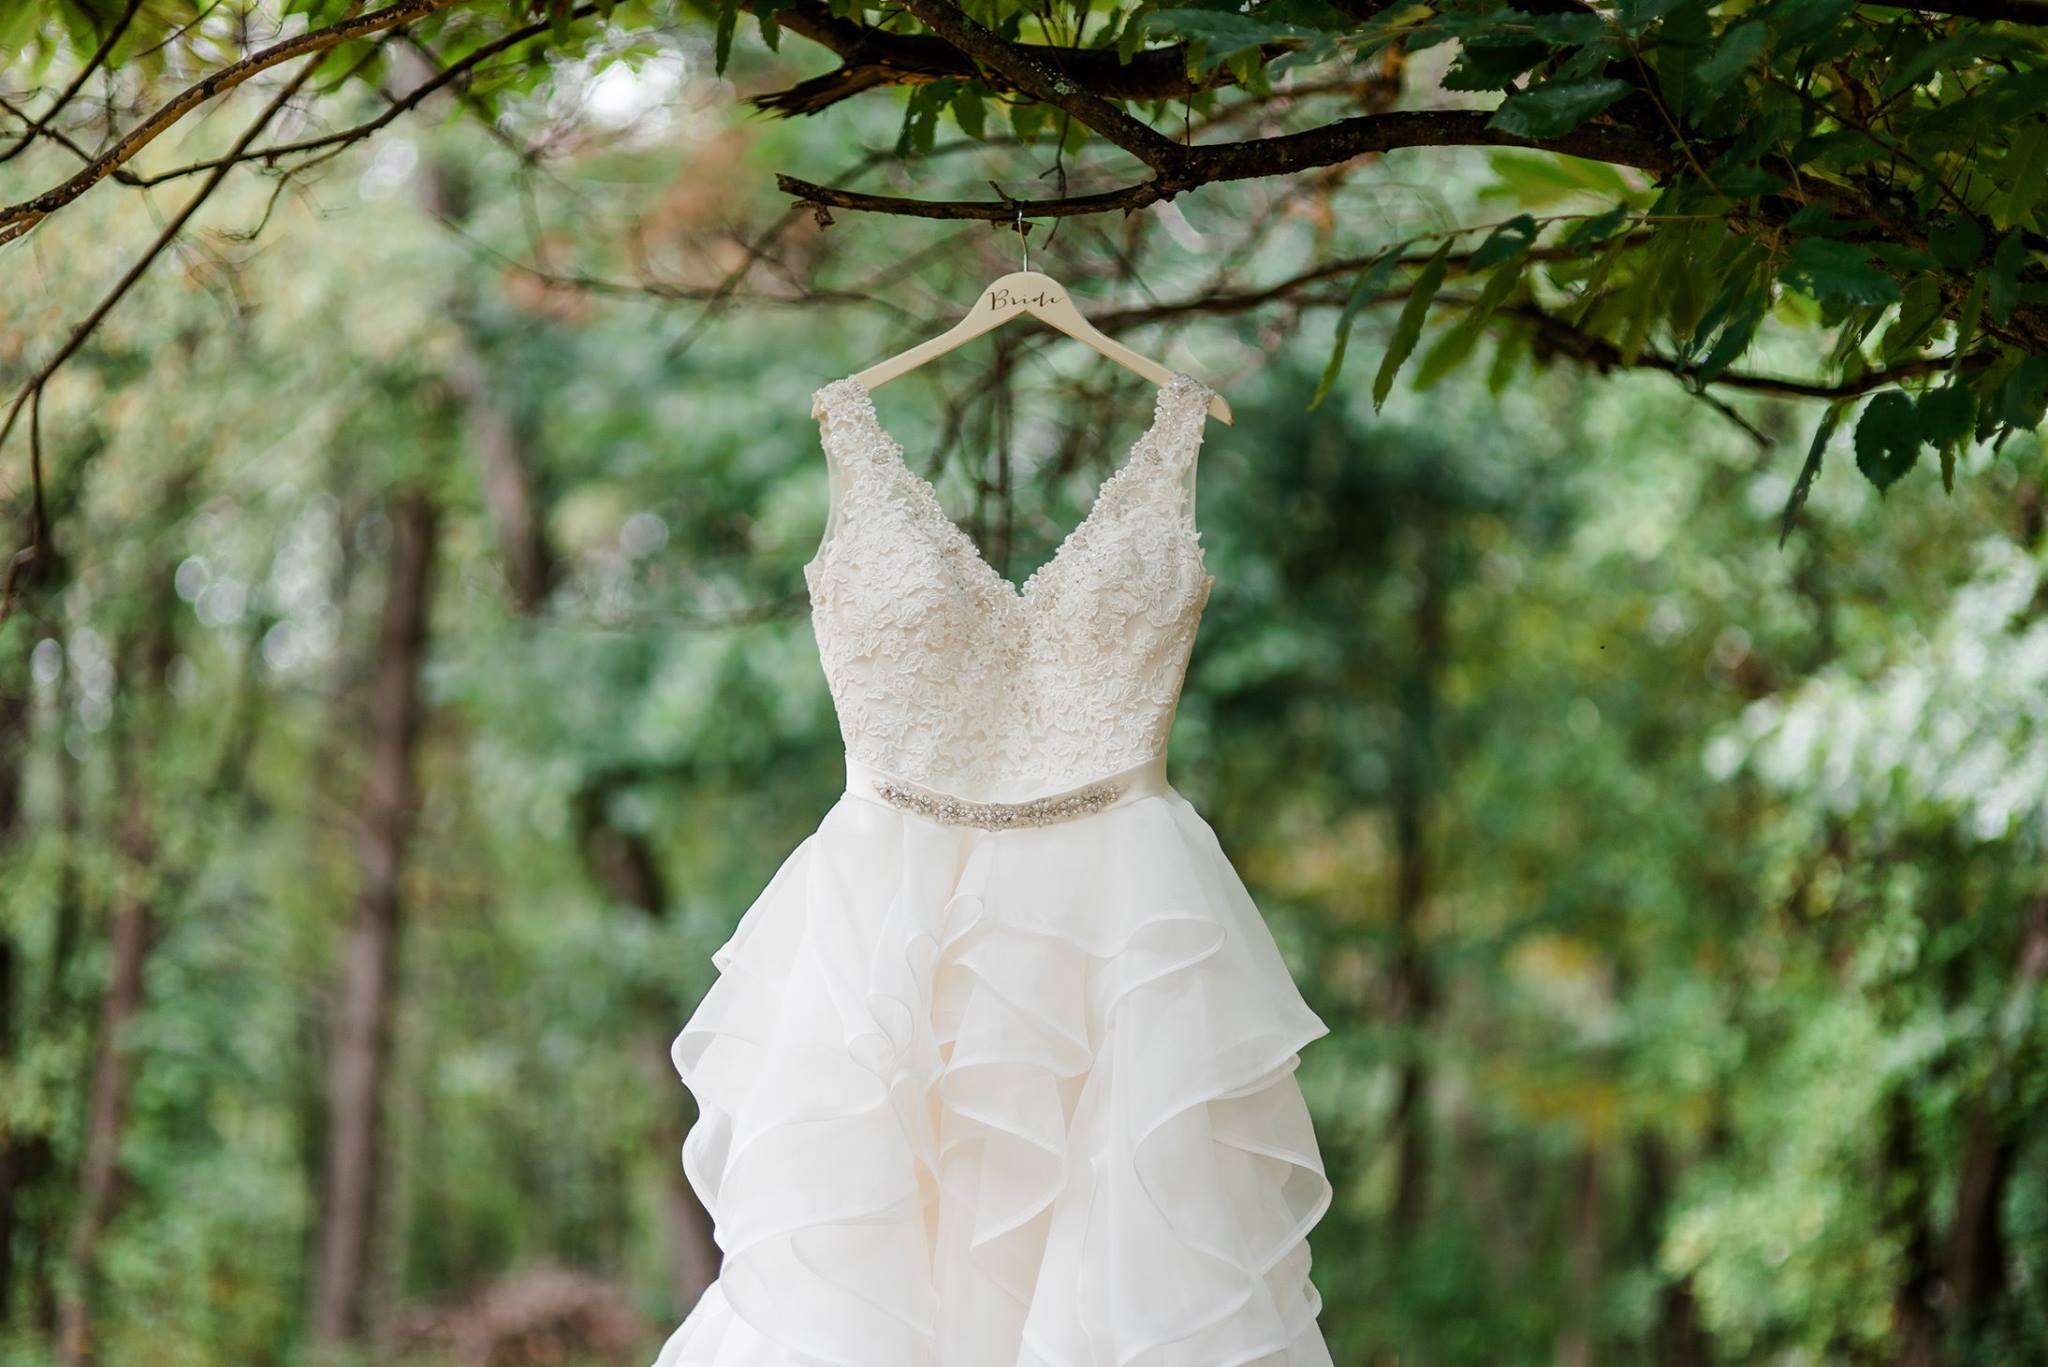 pennsylvania-backyard-wedding-love-diy-bohemian-romantic-colorful-0001.jpg